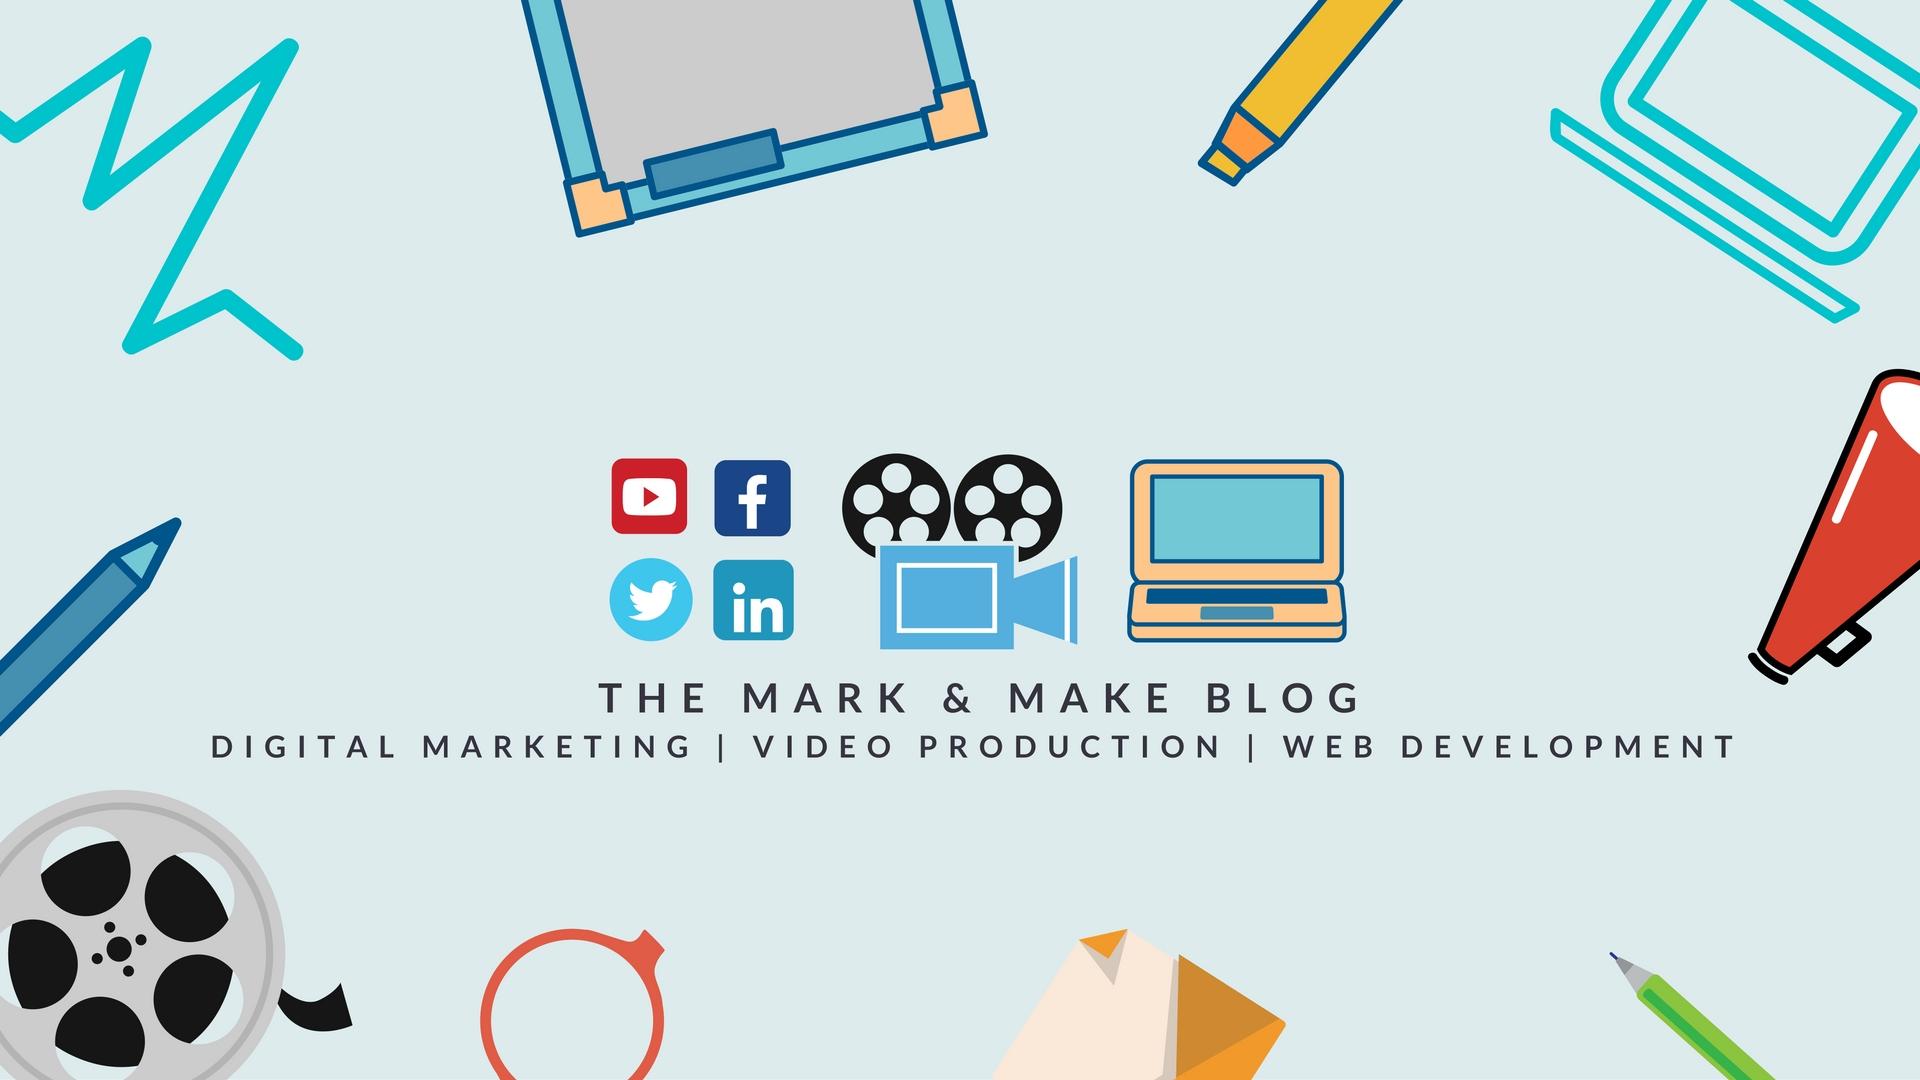 Mark & Make Media Pvt Ltd